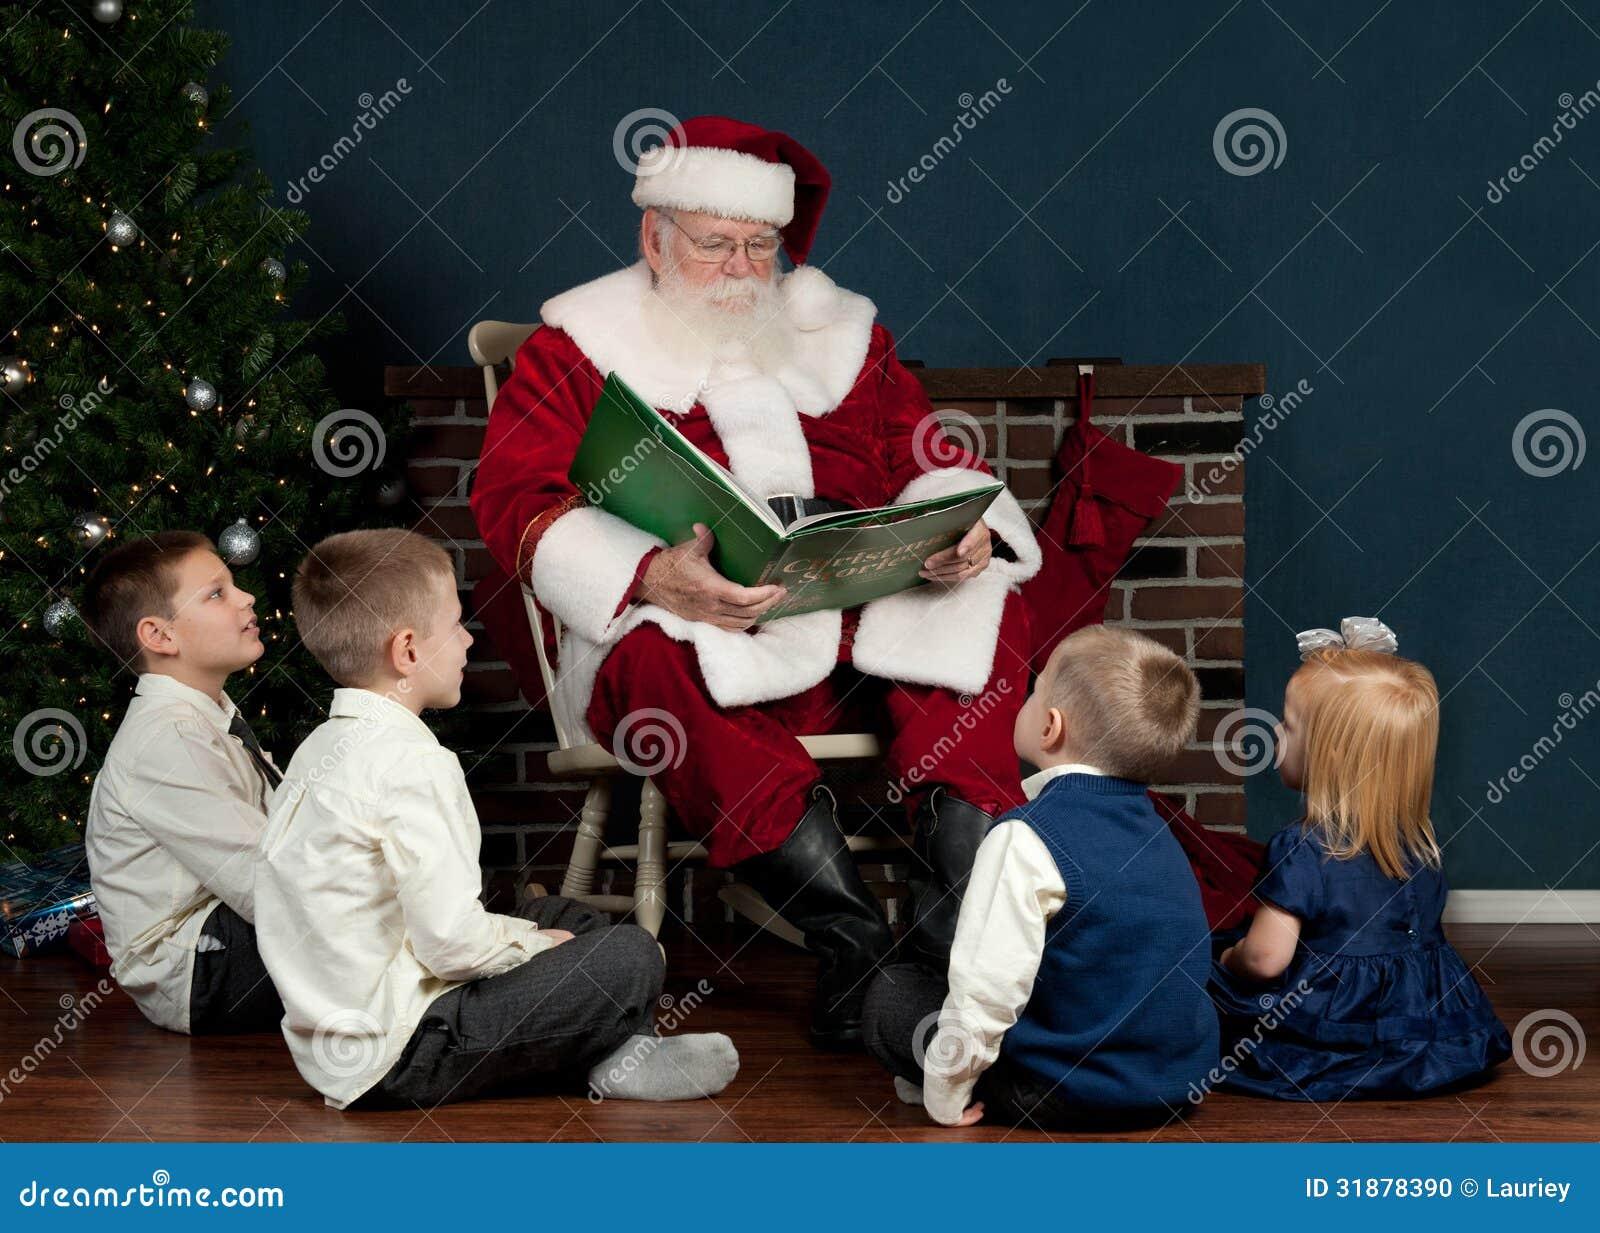 Santa reading to kids stock photo. Image of book, saint - 31878390